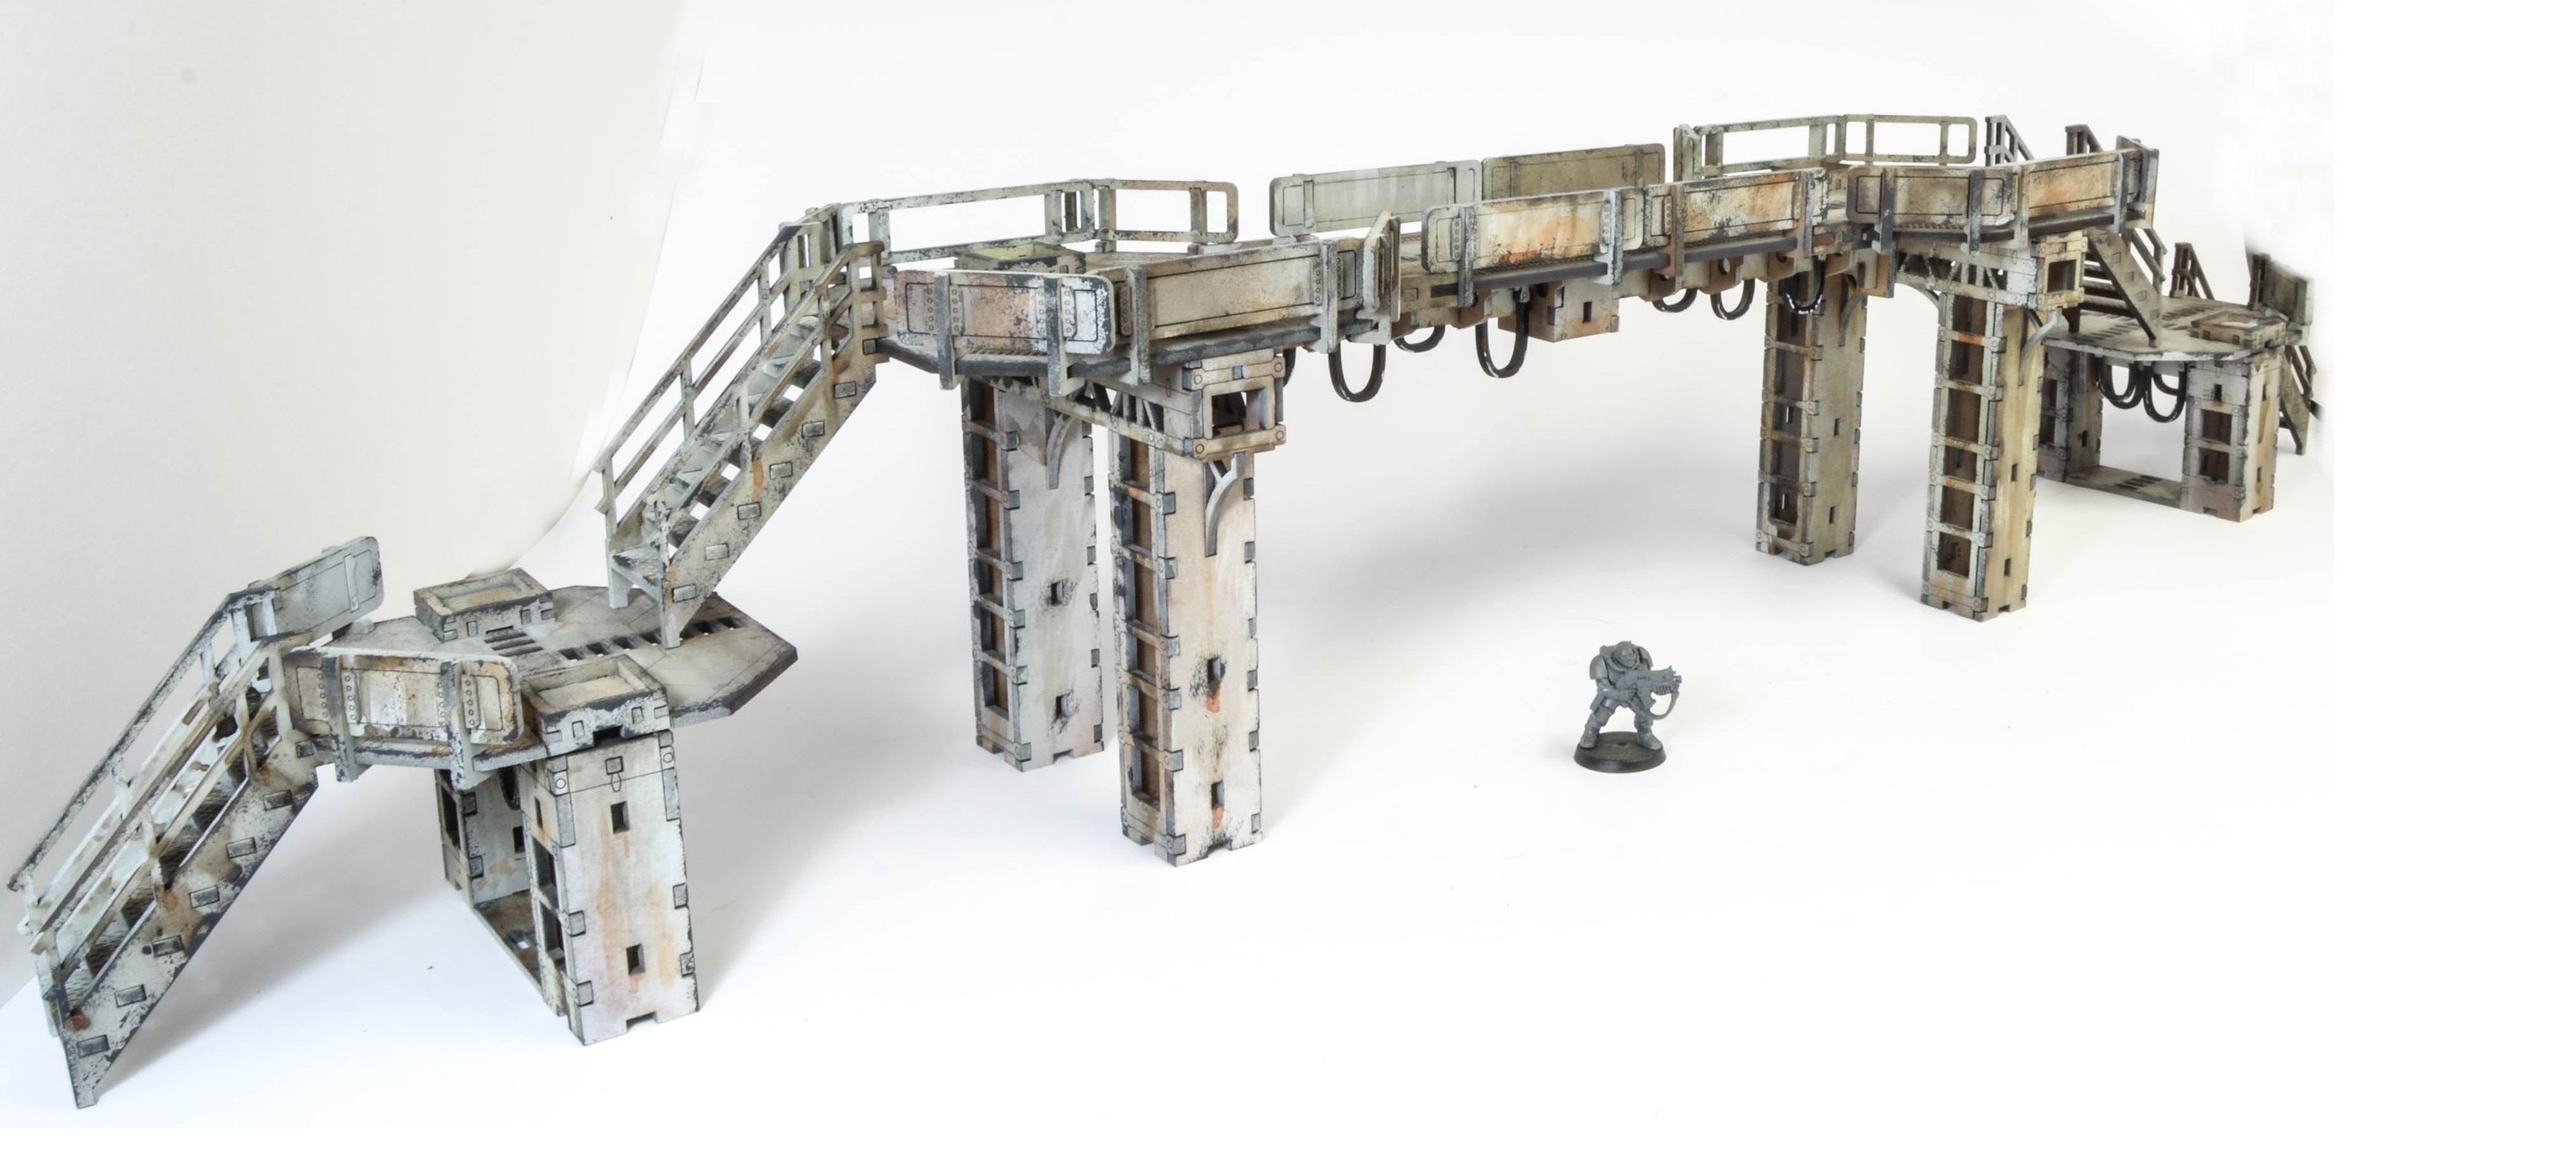 Modular Catwalks & Platforms A